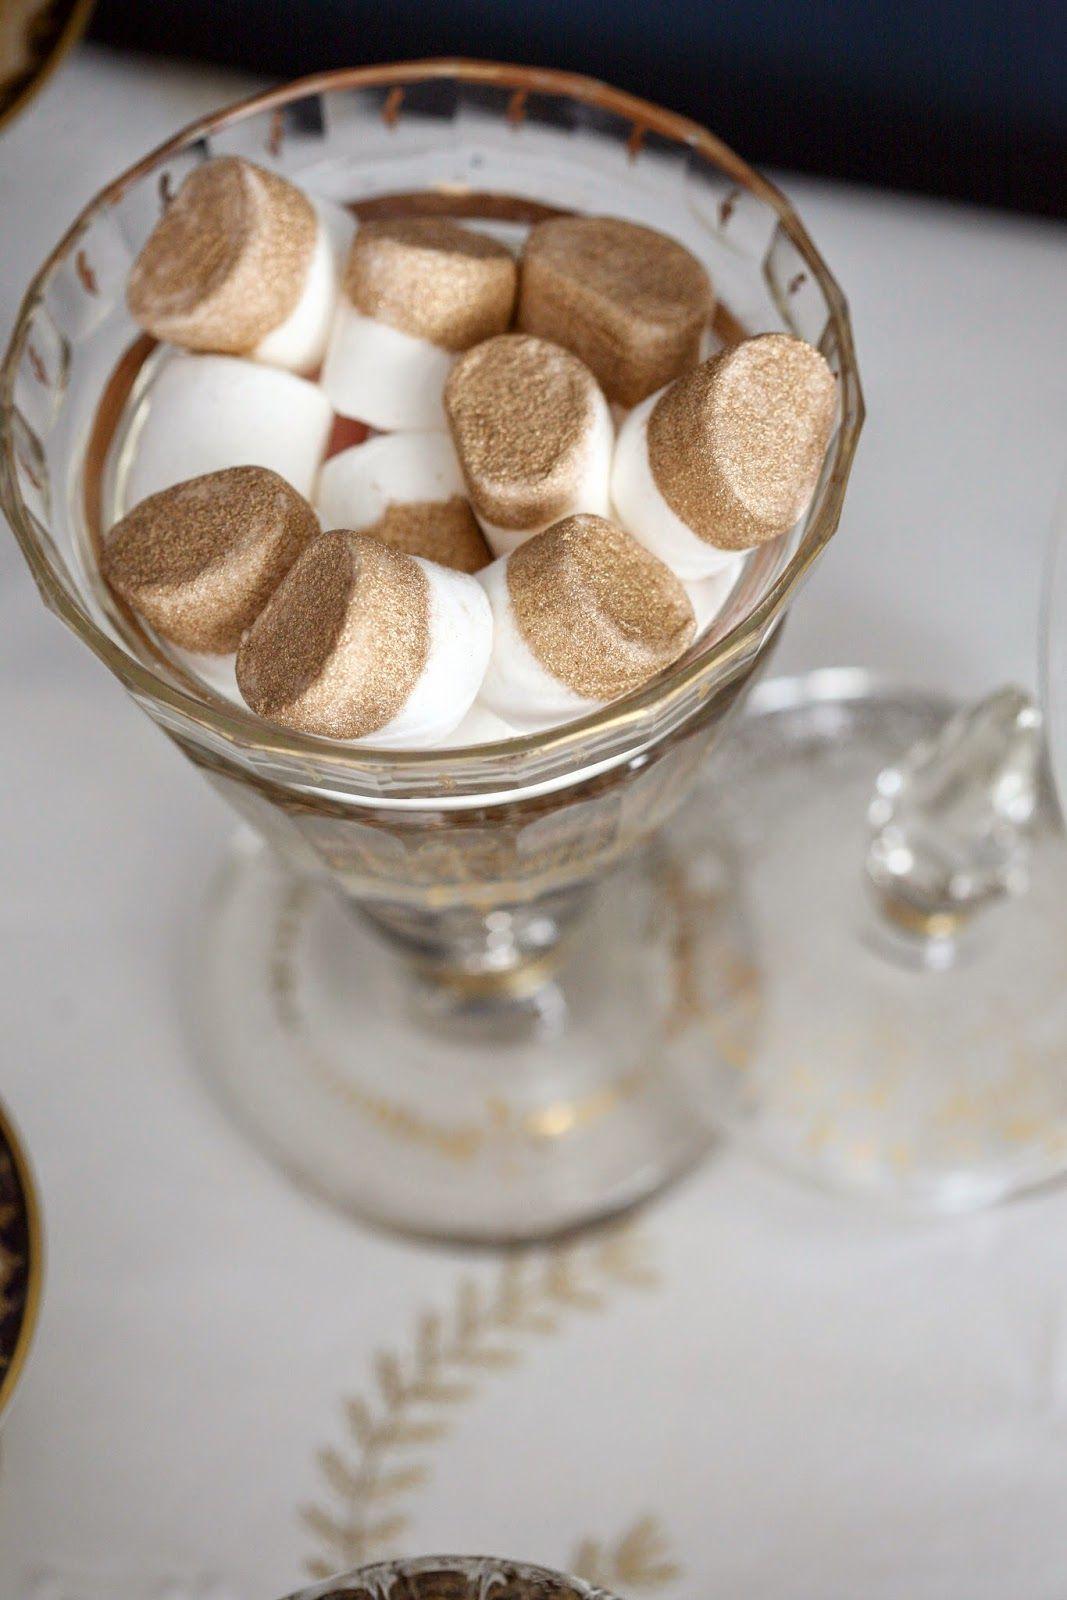 Gold Edible Glitter + Marshmallows = Masha Mallow for Shopkins Birthday Party